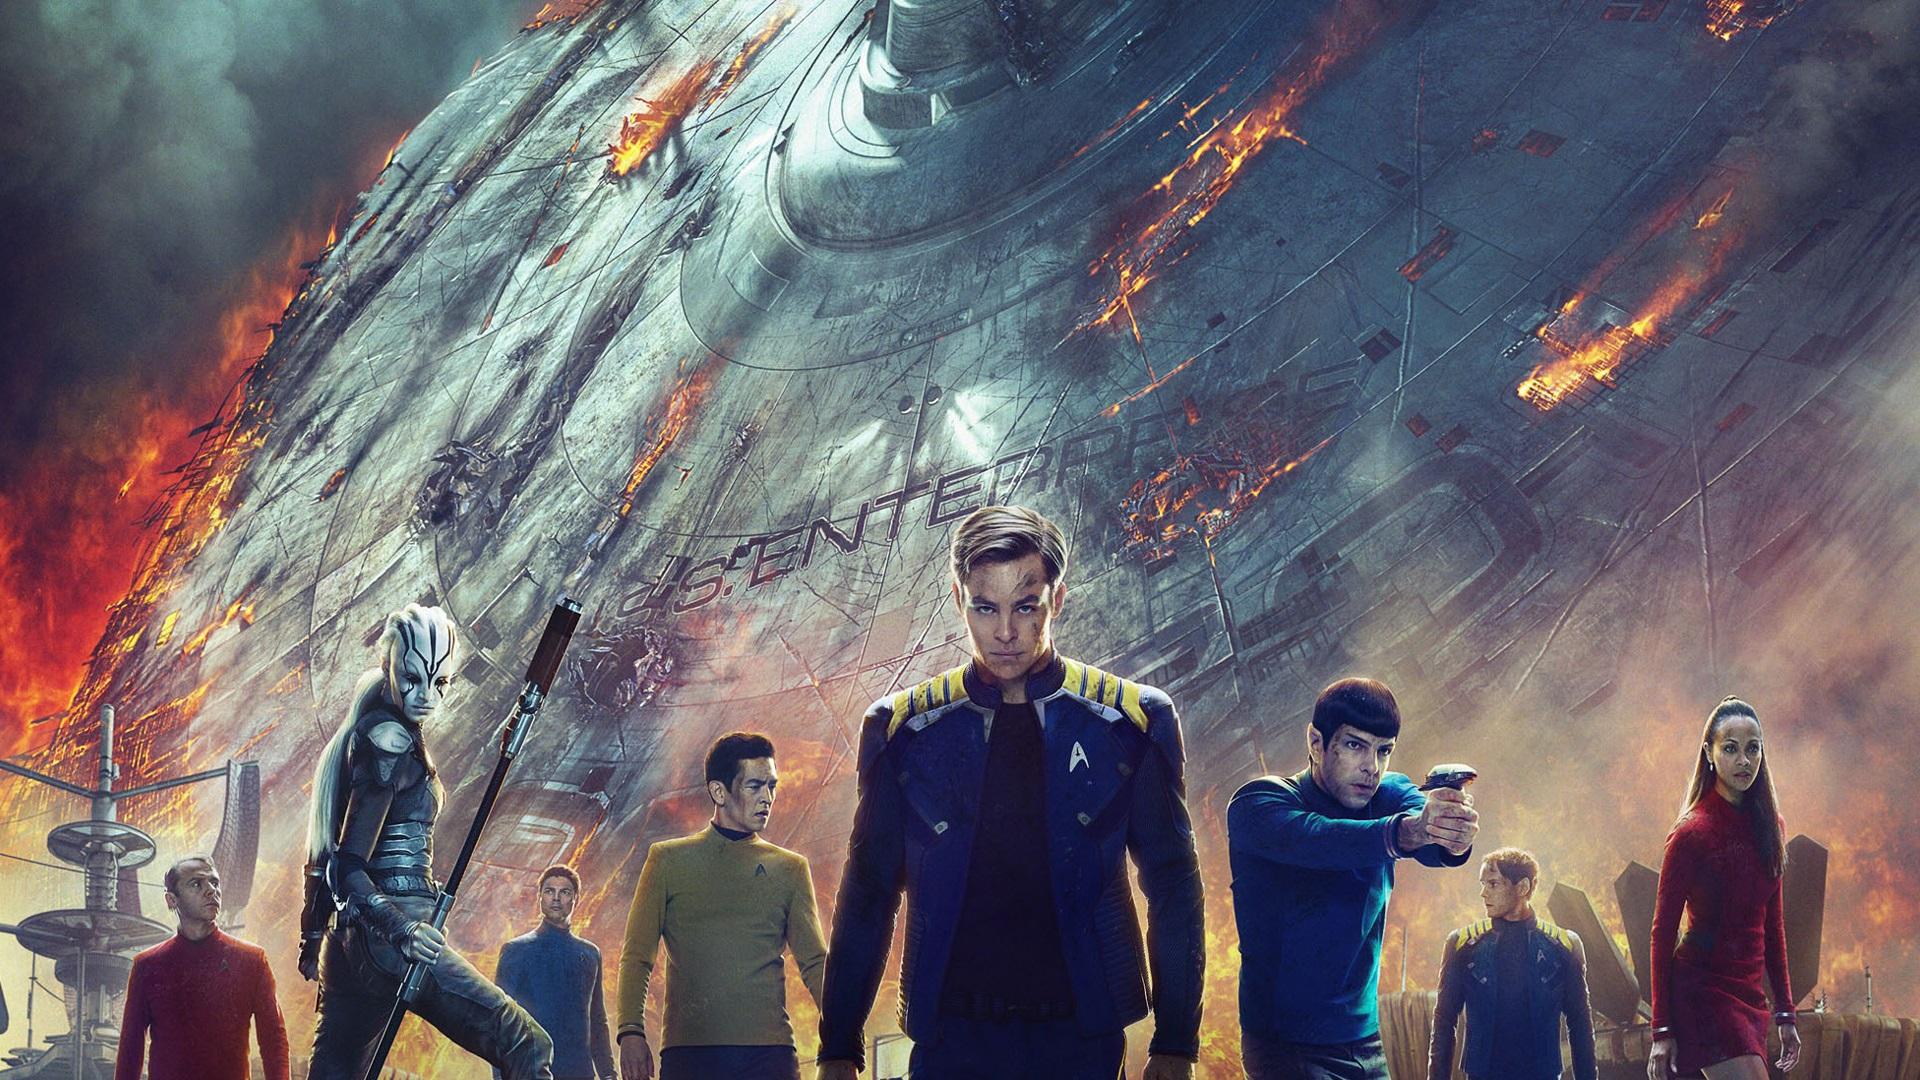 Wallpaper 2016 Movie Star Trek Beyond 1920x1080 Full Hd 2k